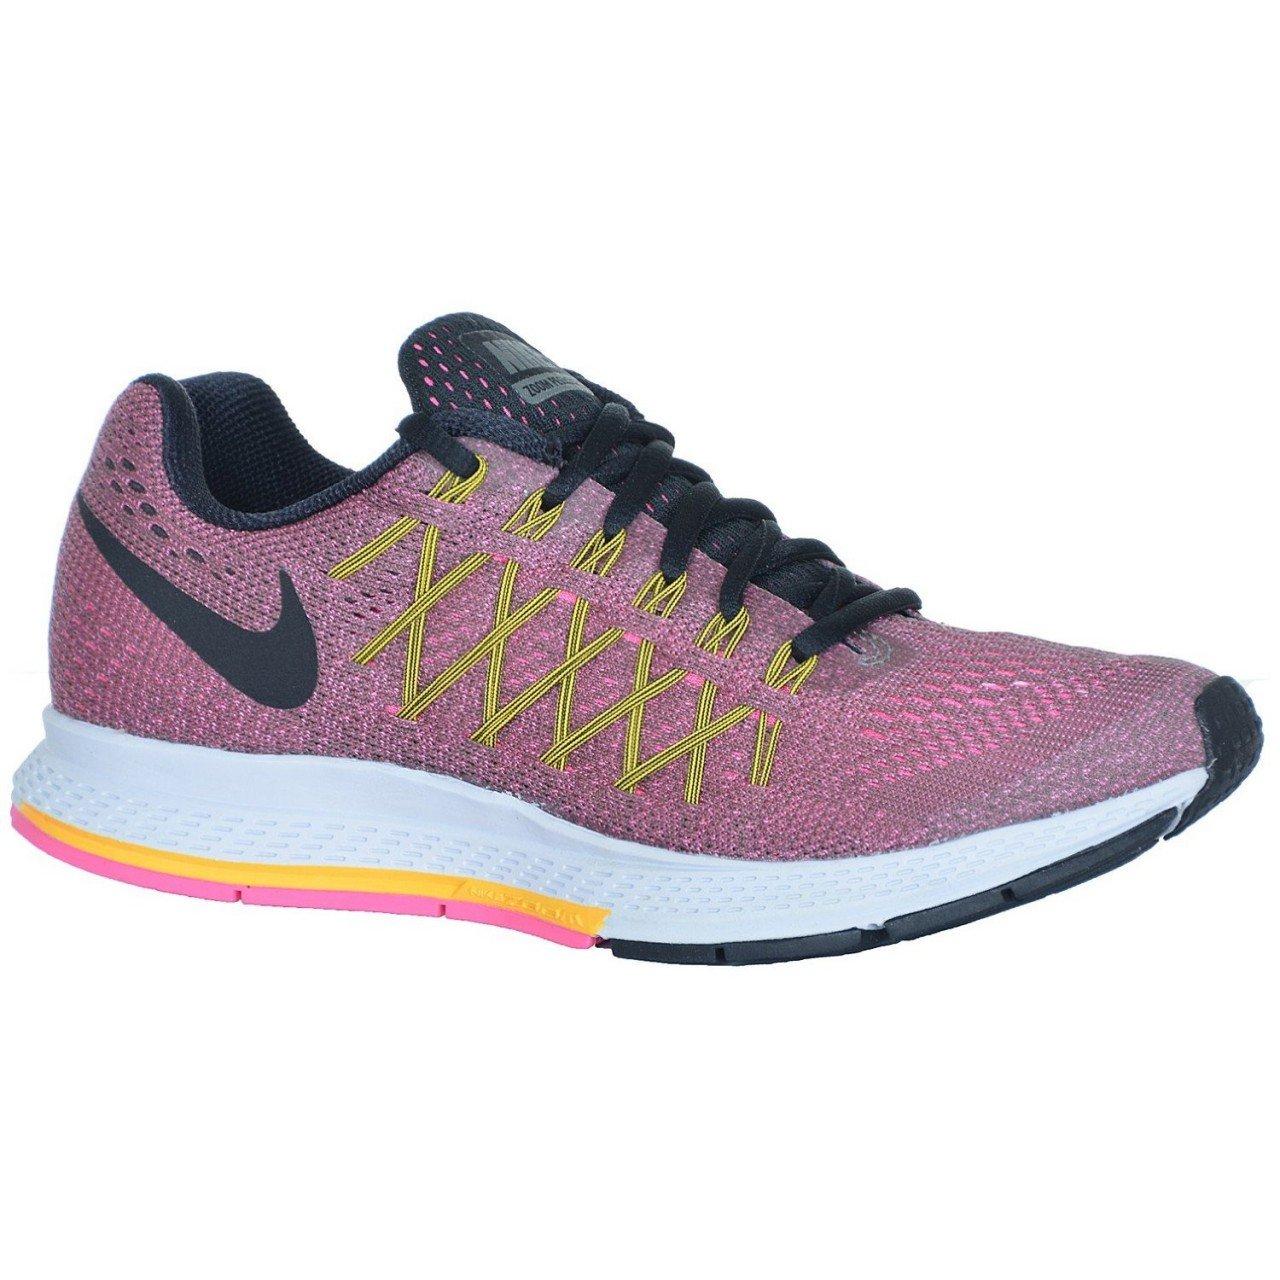 Nike Wmns Air Zoom Pegasus 32 - tmbld gry blck-lsr orng-pnk pw, Größe   5.5